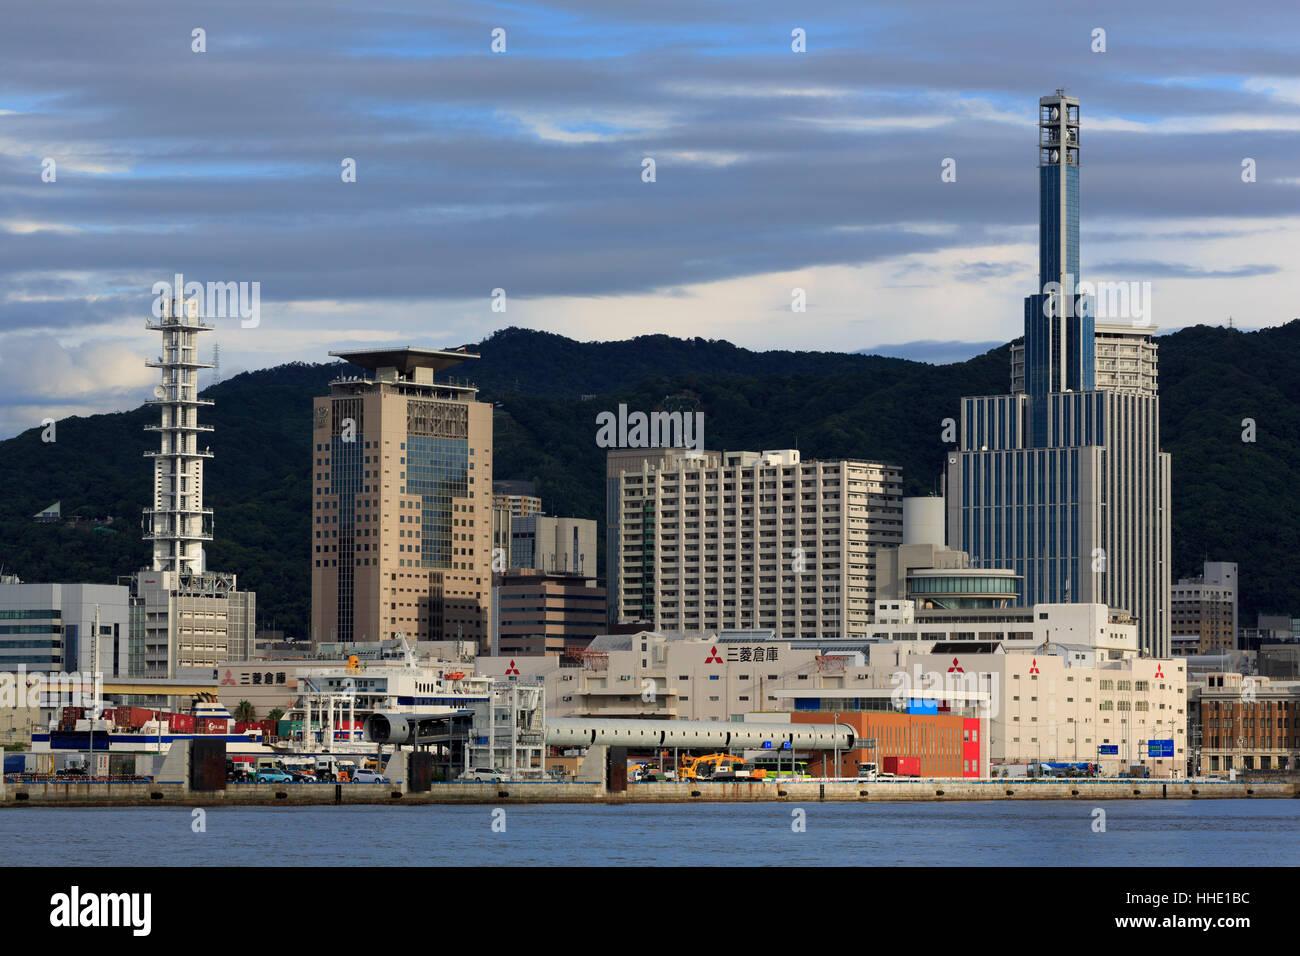 Skyline, Kobe City, Honshu Island, Japan - Stock Image